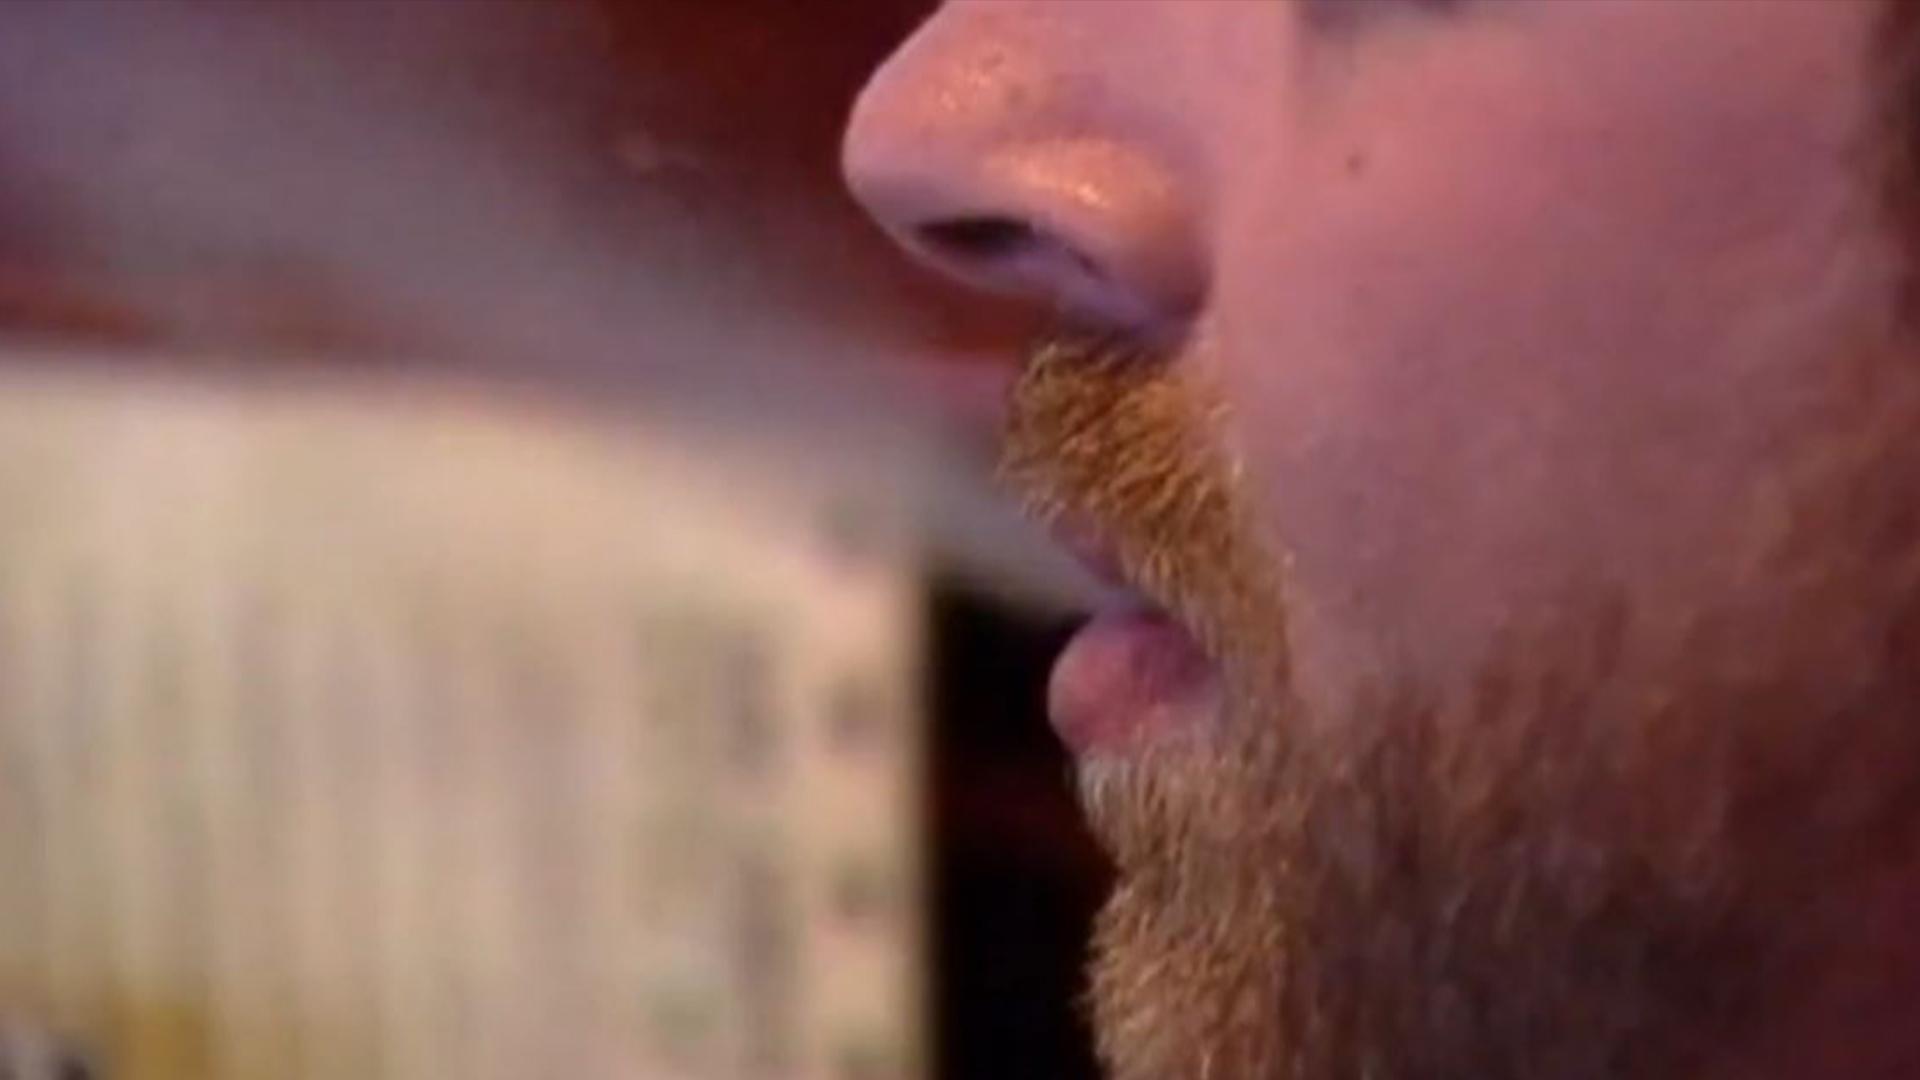 E-Cigarette Poisonings Skyrocket, Mostly in Kids